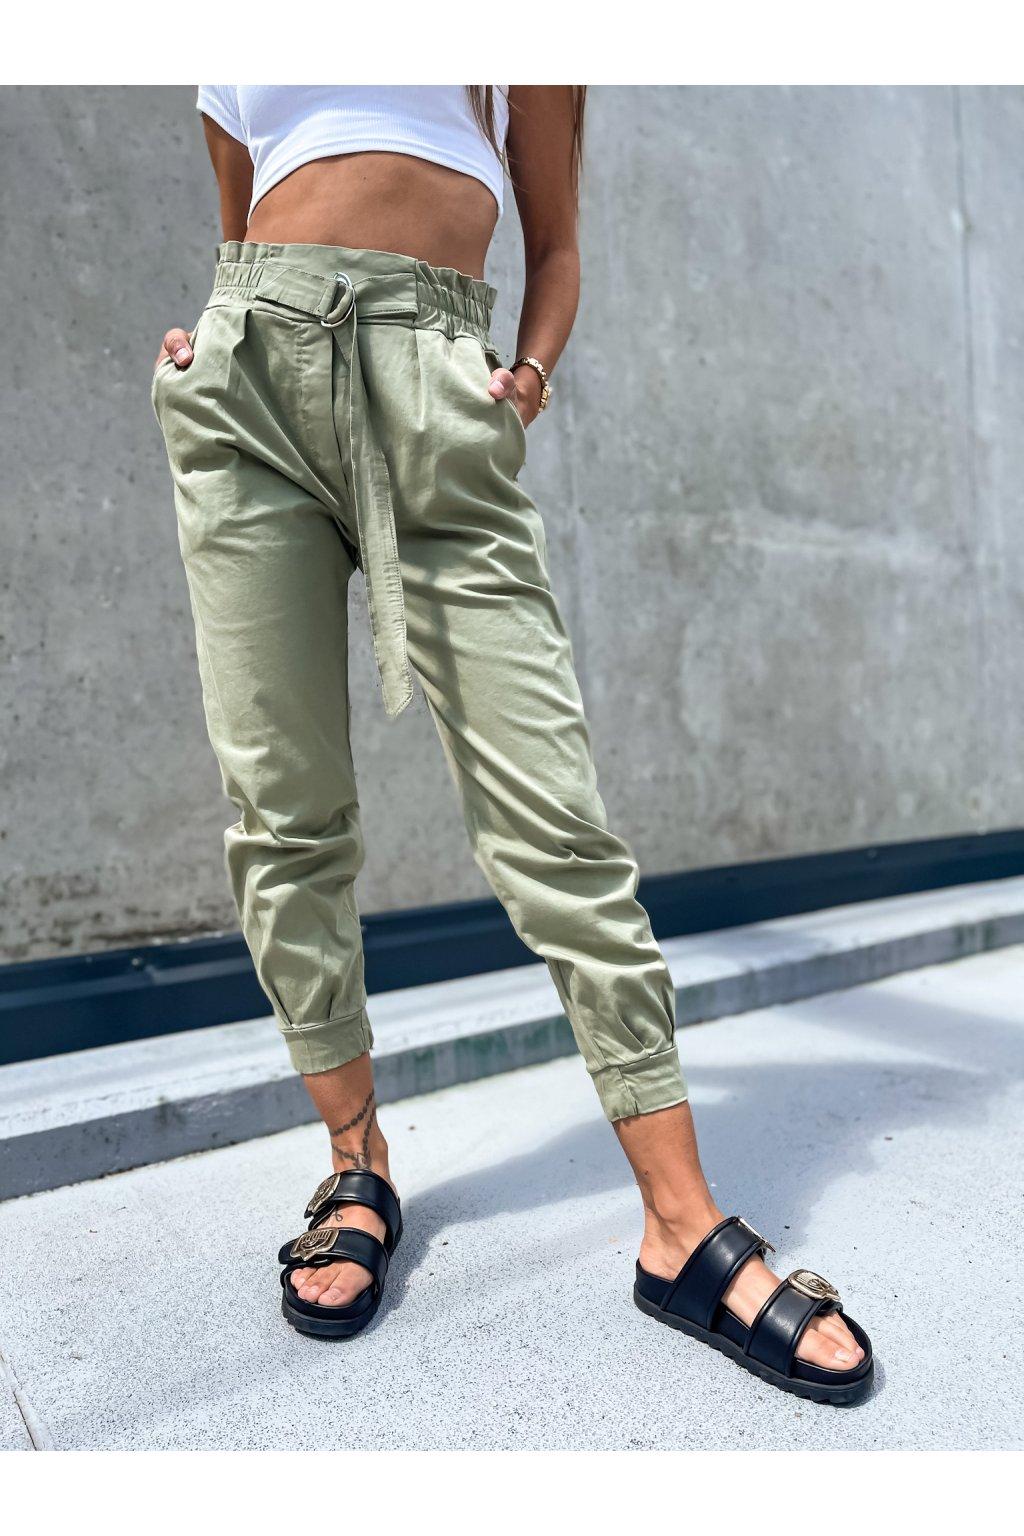 damske kalhoty s vysokym pasem italy light khaki eshopat cz 2